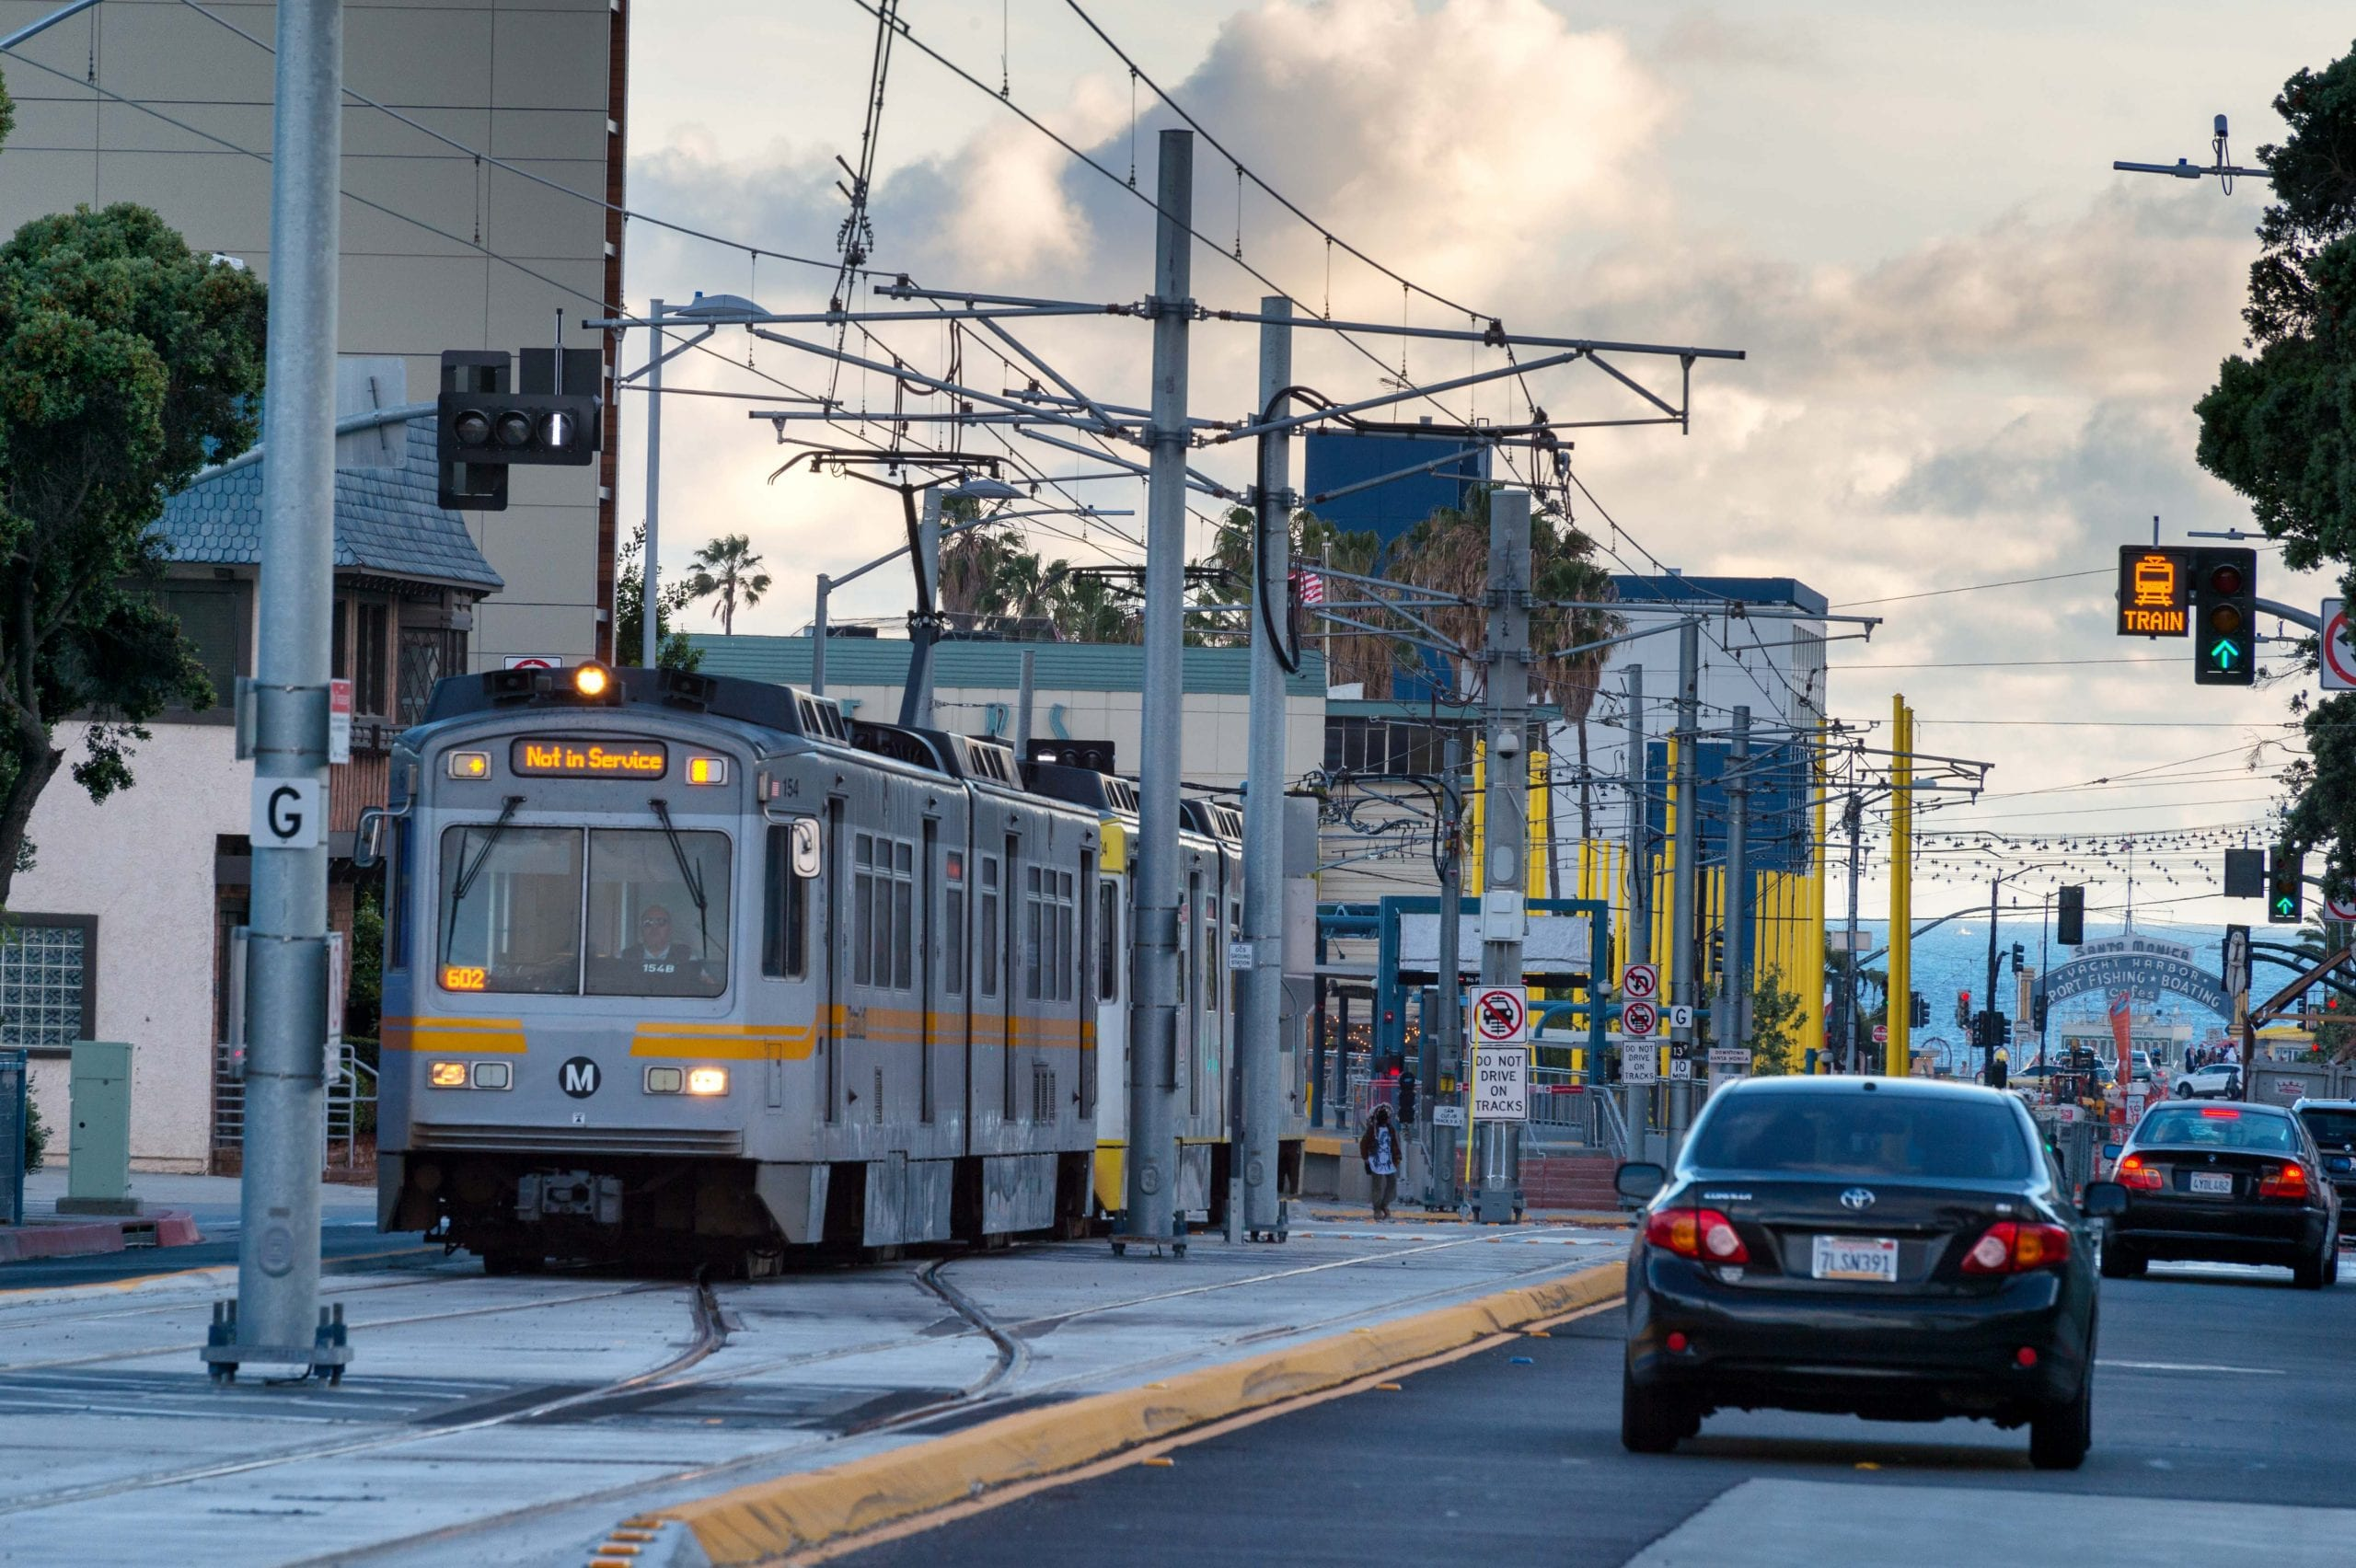 Train, meet ocean. Ocean, meet train. Photo by Steve Hymon/Metro.